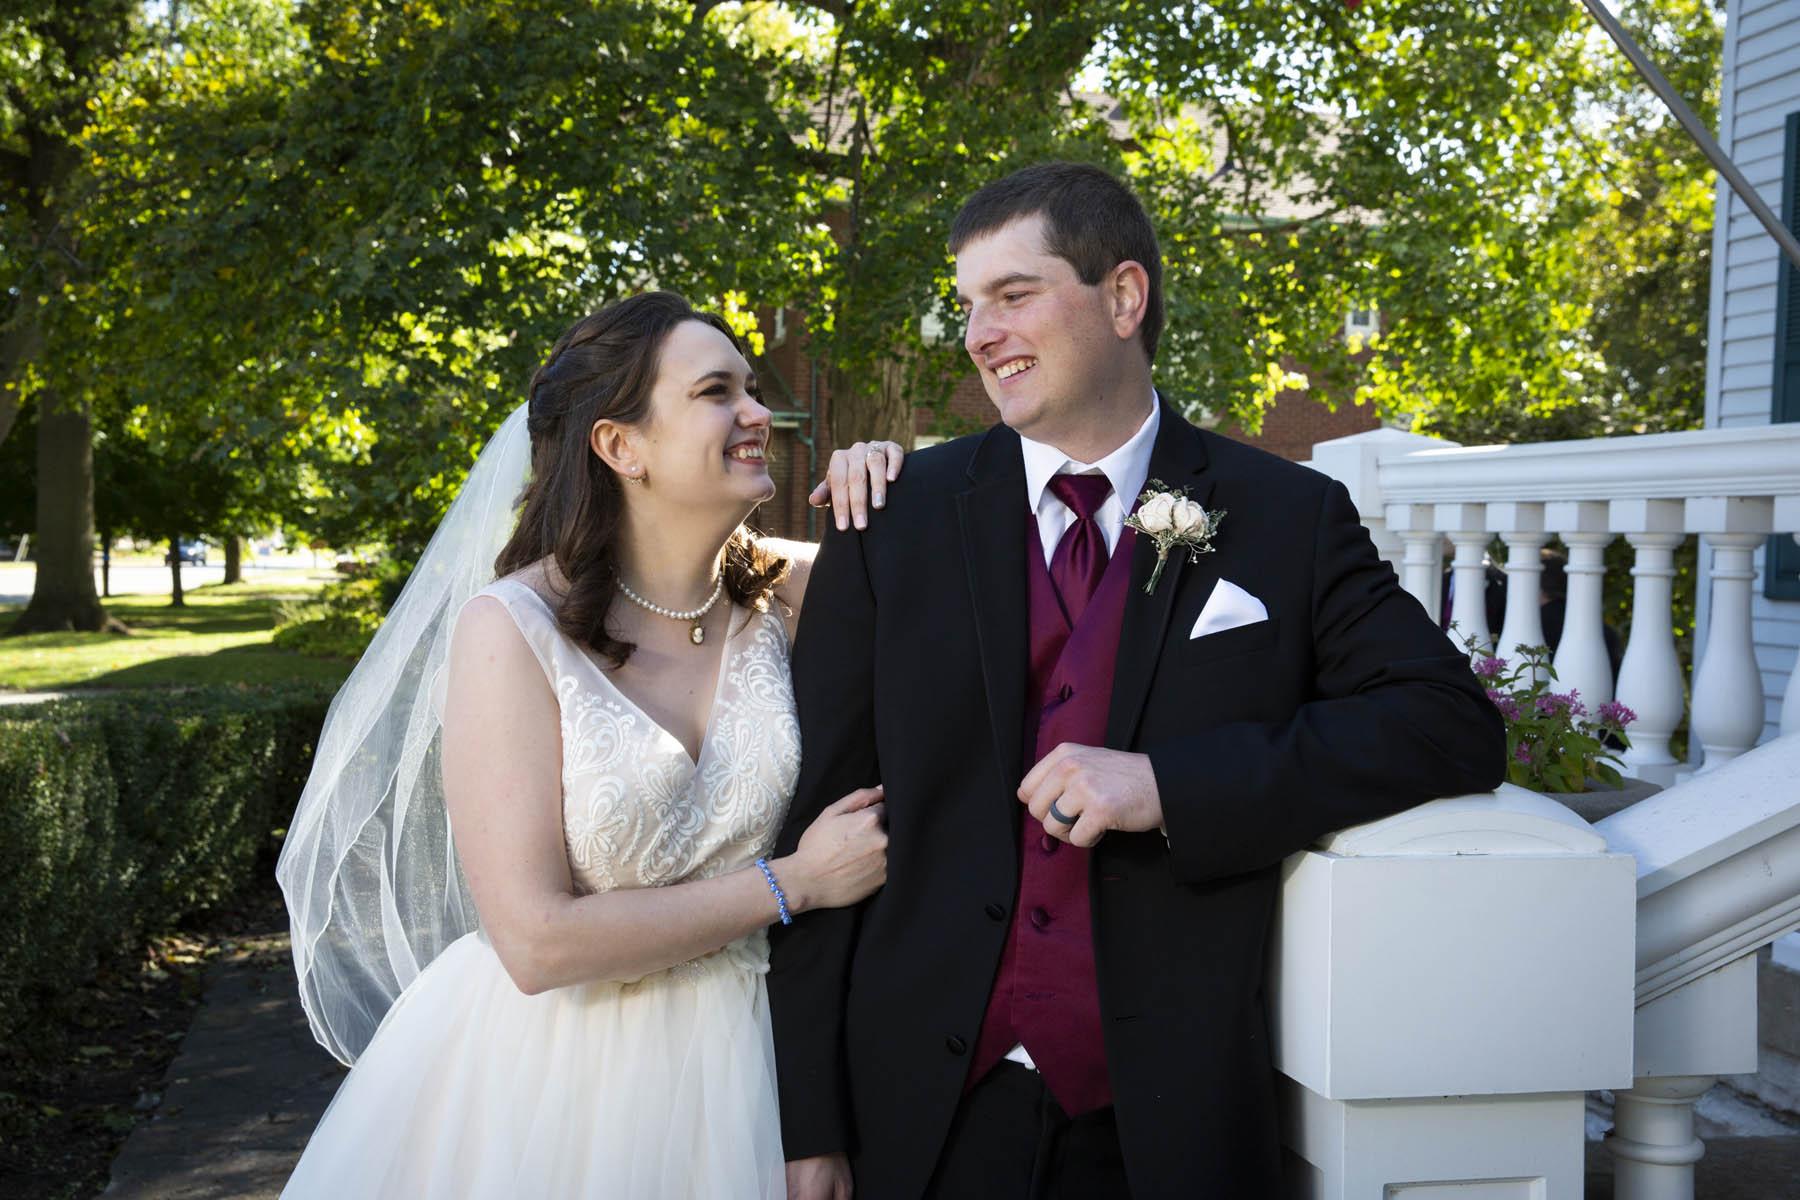 Wedding of Jenny Angelo & Alex Meyer Saturday 12 October 2019 at Greene Gables in White HallPhotos by Steve & Tiffany of Warmowski Photography http://www.warmowskiphoto.com 217.473.5581 - 191012